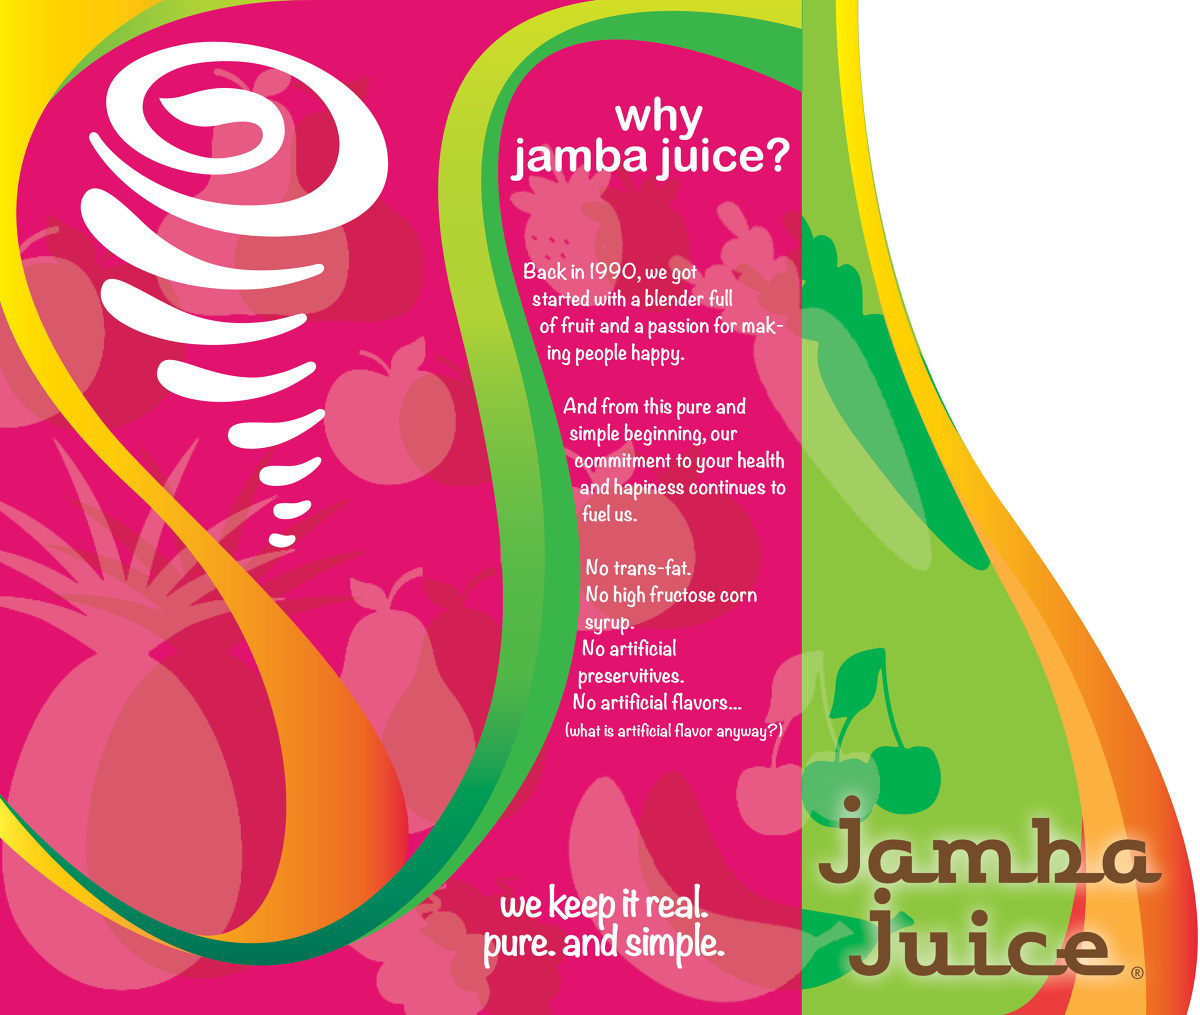 Why Jamba Juice